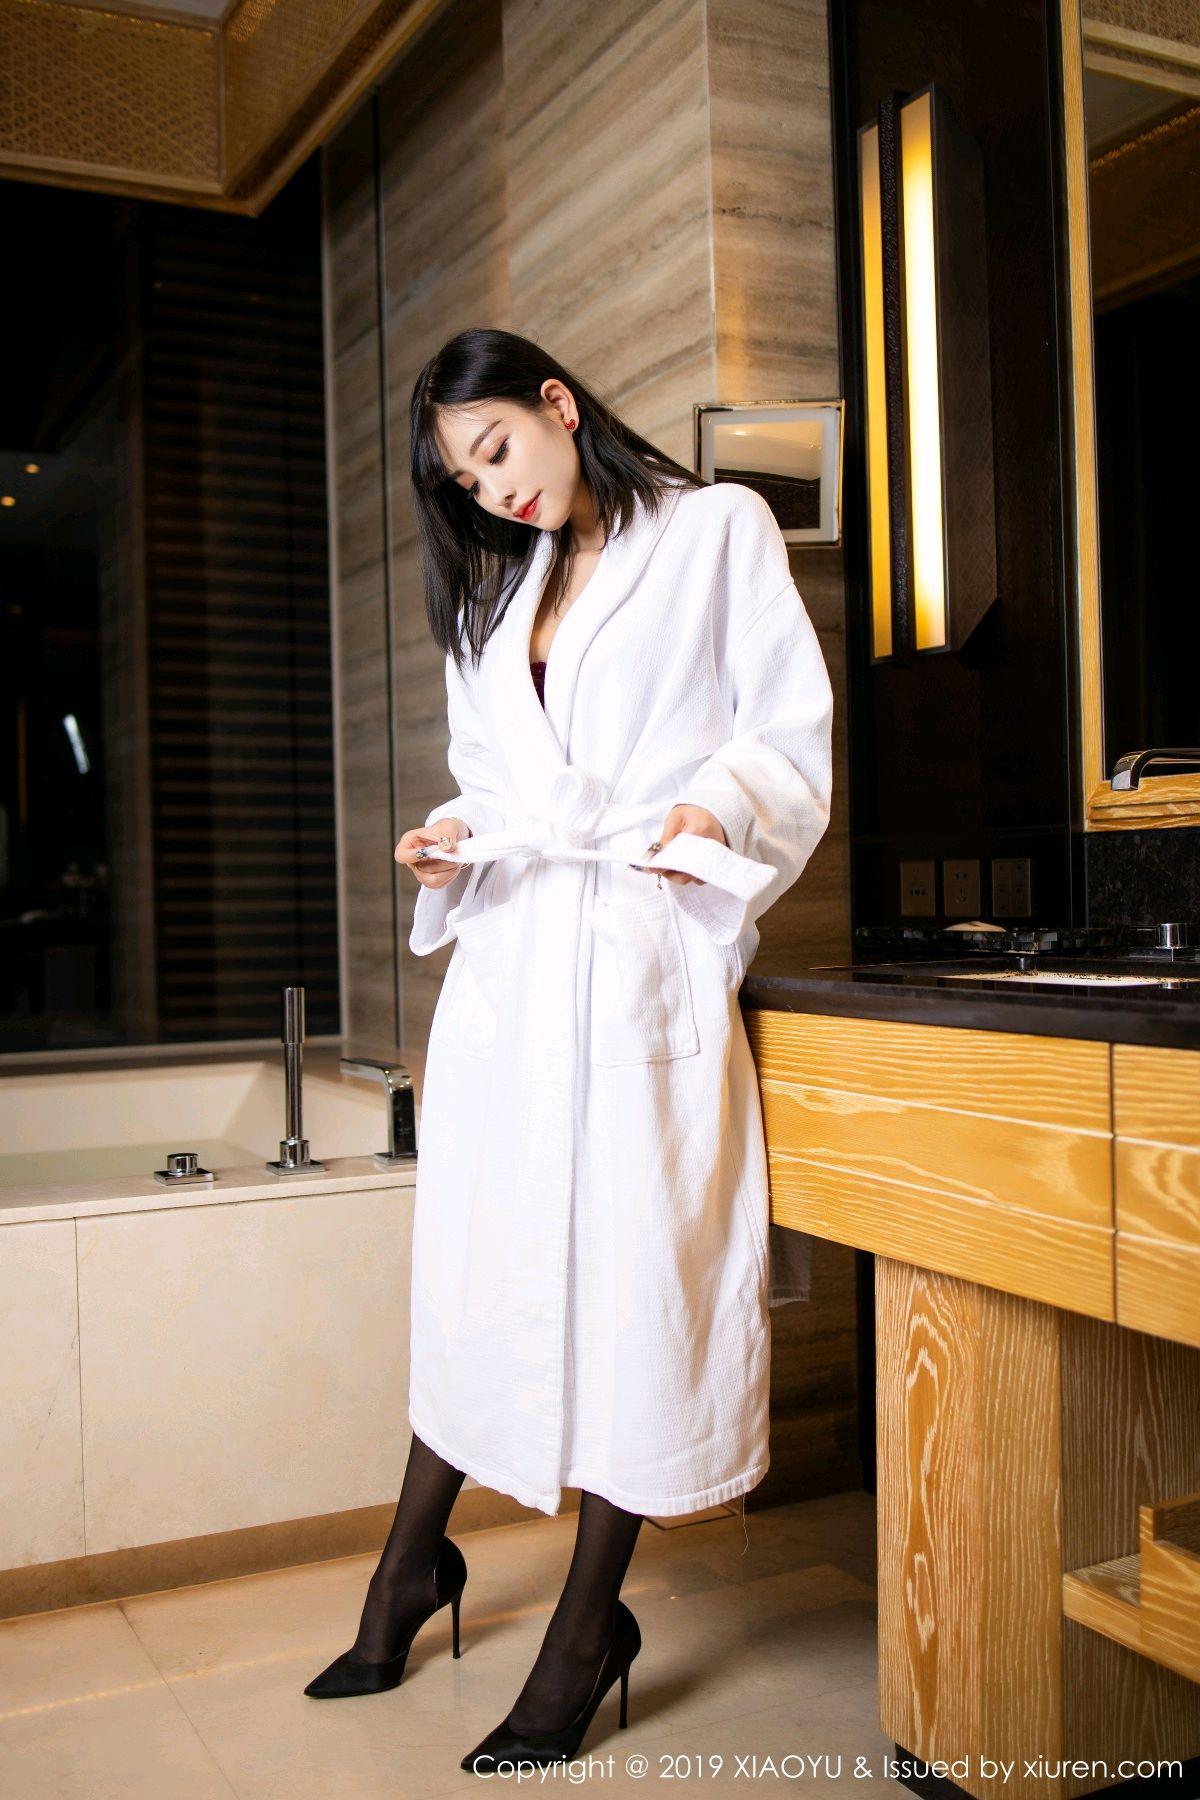 [XiaoYu] Vol.153 Yang Chen Chen 7P, Bathroom, Black Silk, Underwear, XiaoYu, Yang Chen Chen